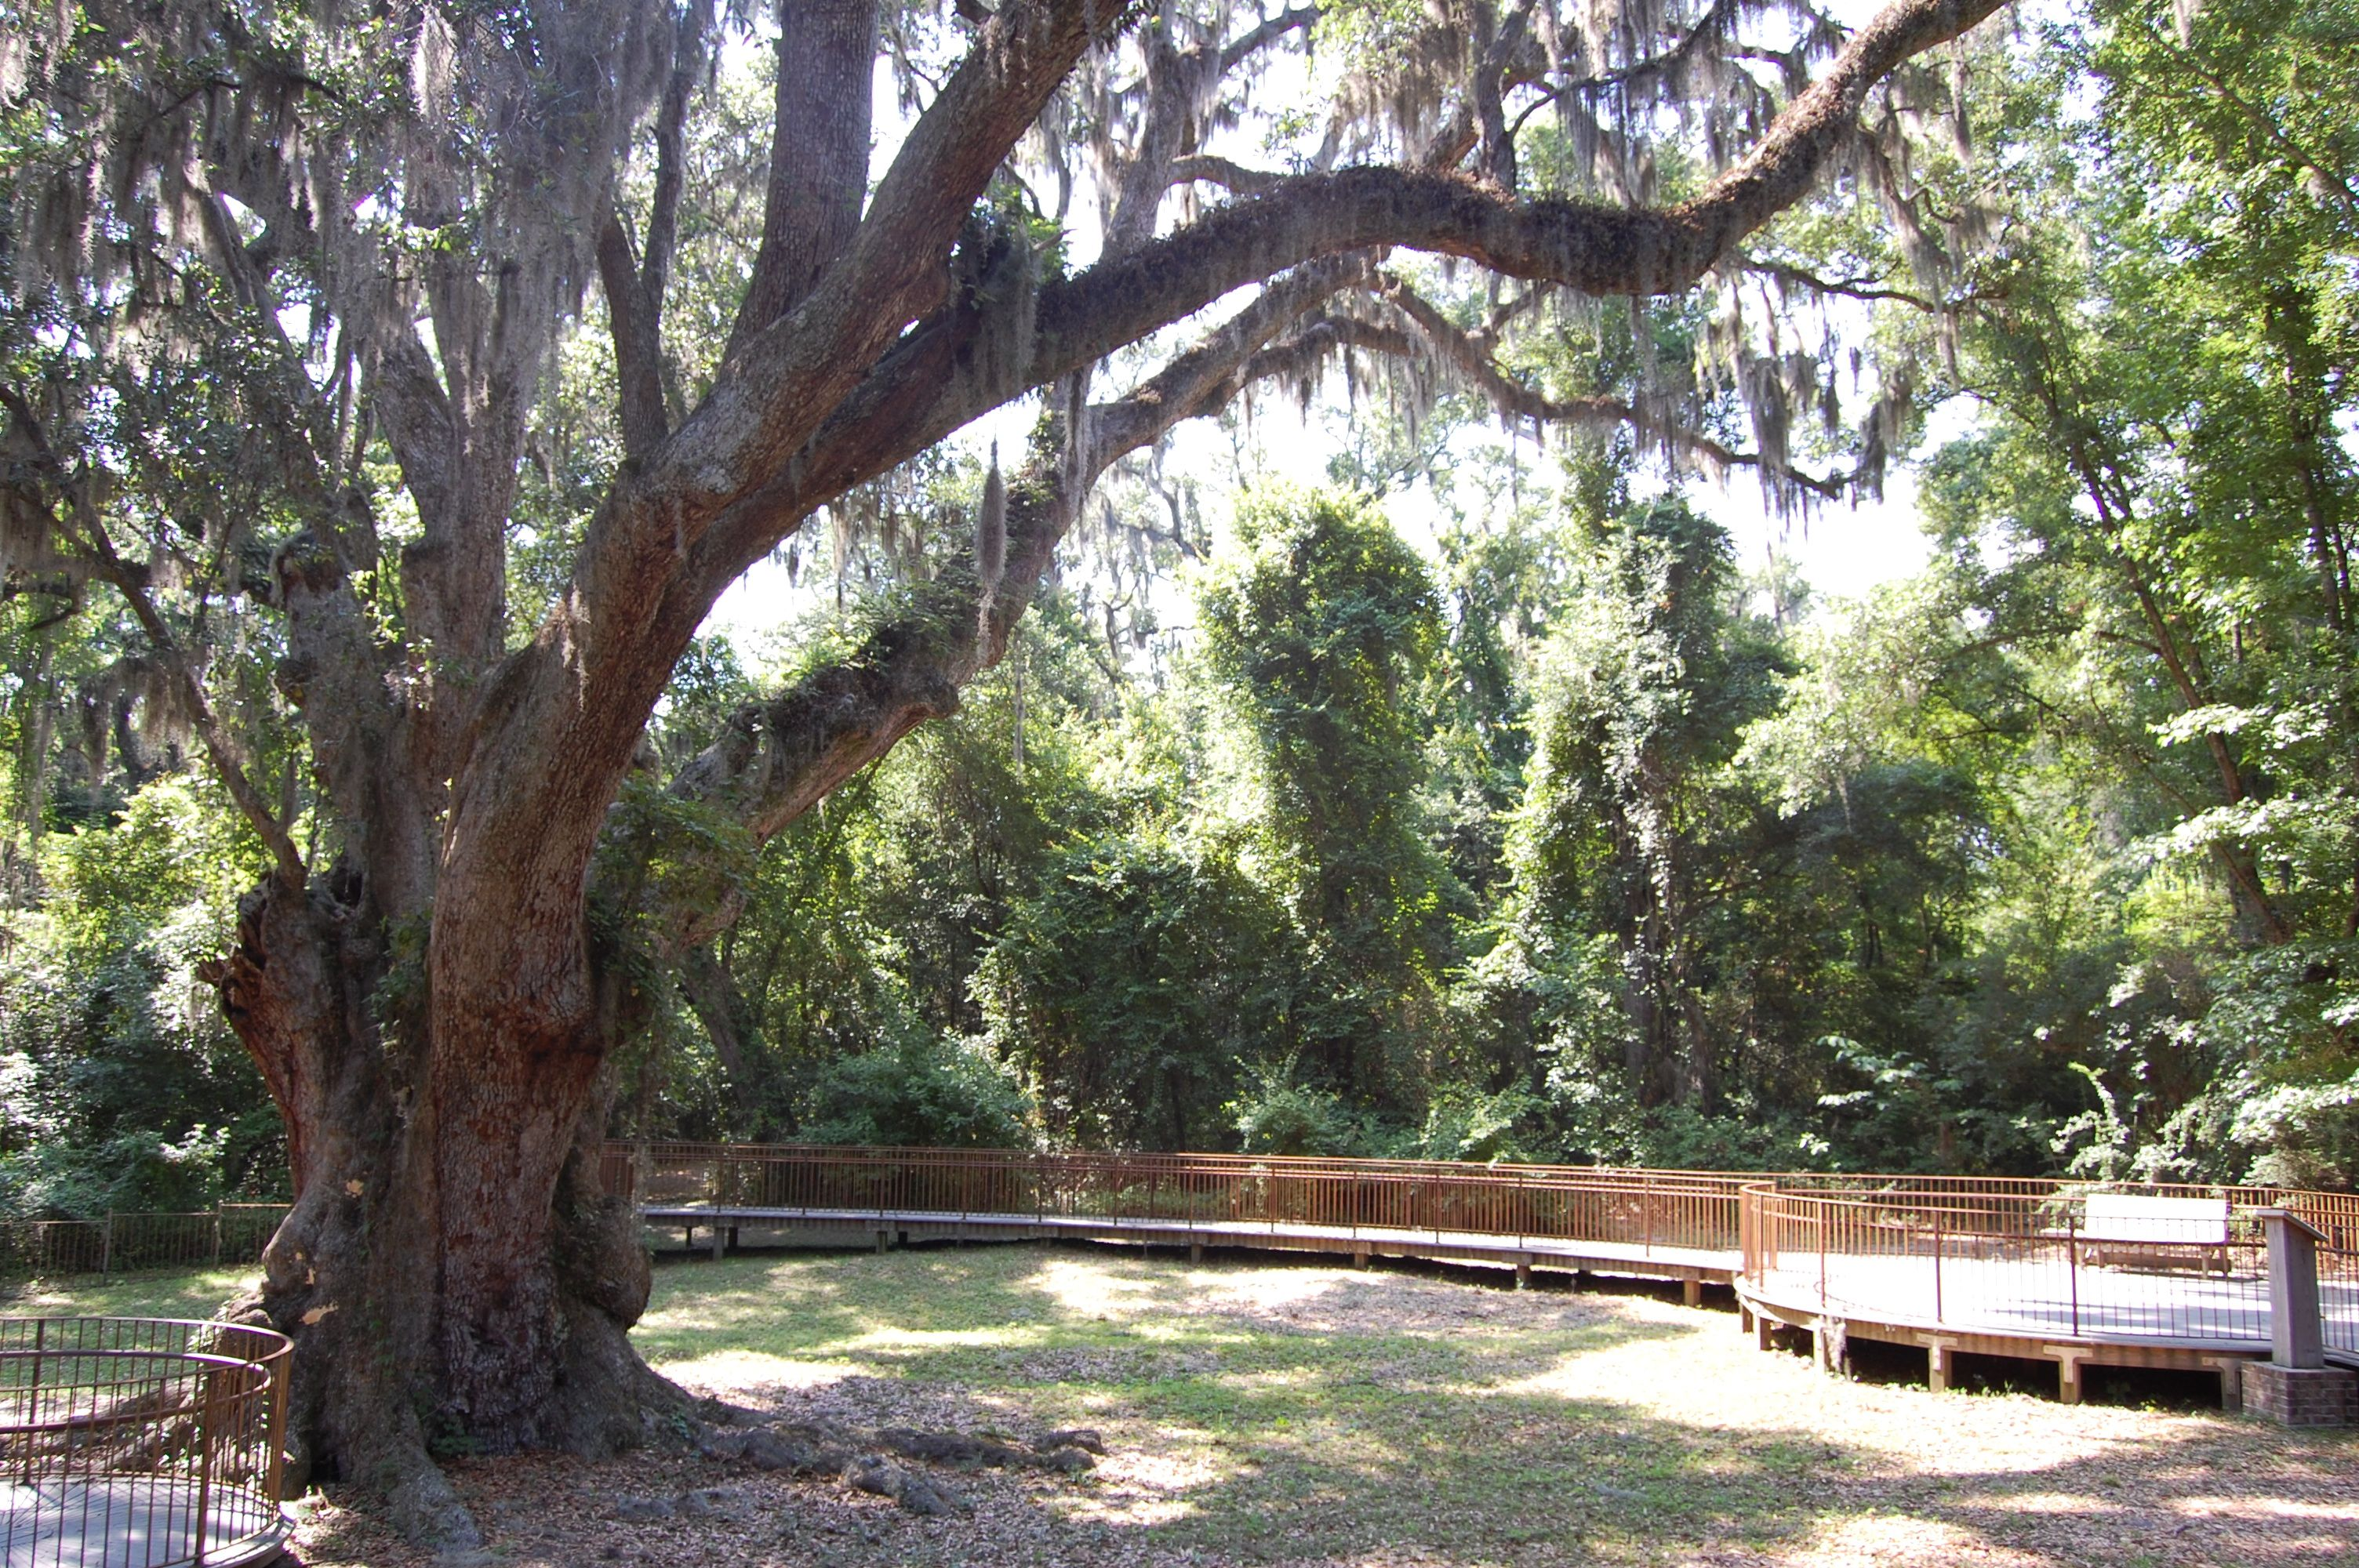 Alabama baldwin county daphne - Jackson S Oak In Daphne Alabama On Mobile Bay S Eastern Shore In Baldwin County